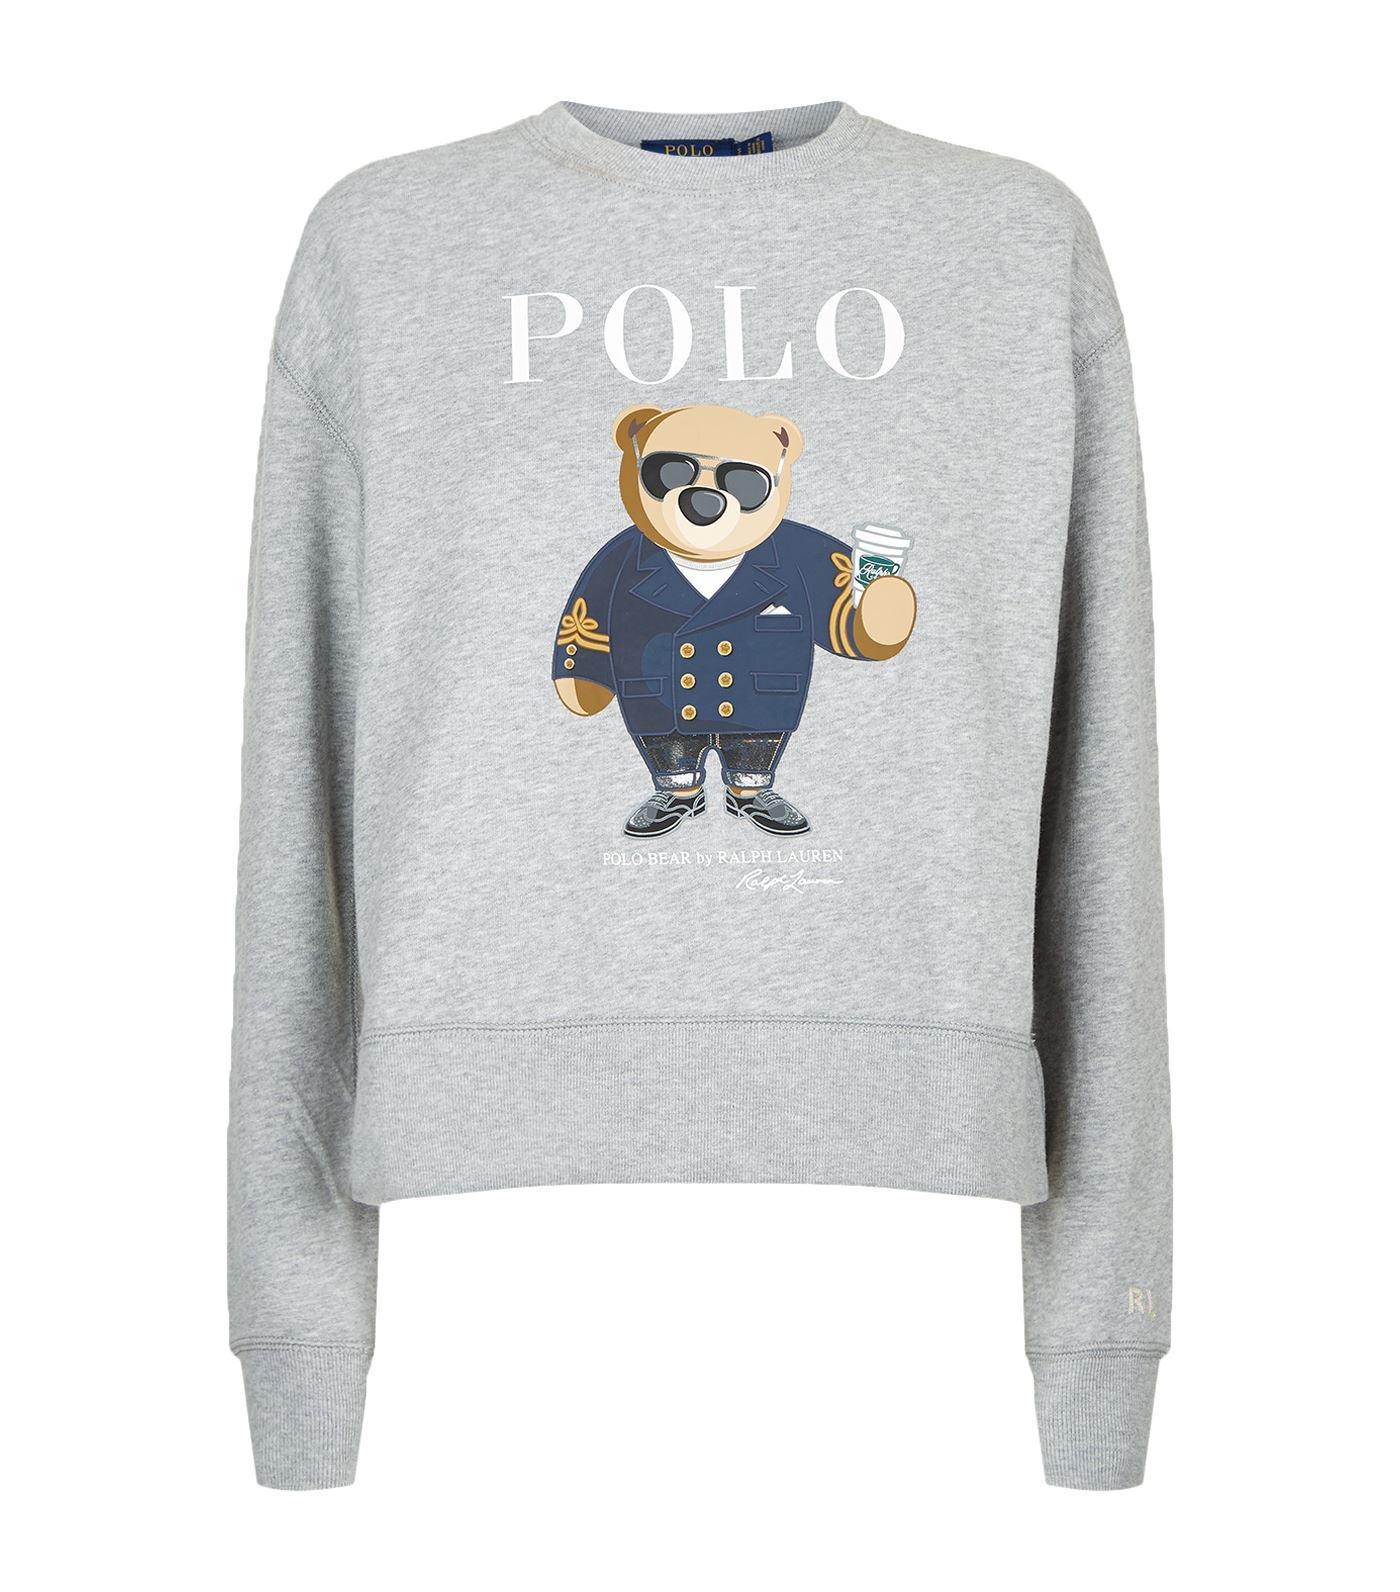 Ralph Print Polo Bear For Lauren Men Gray Sweatshirt Tcl3u1JF5K